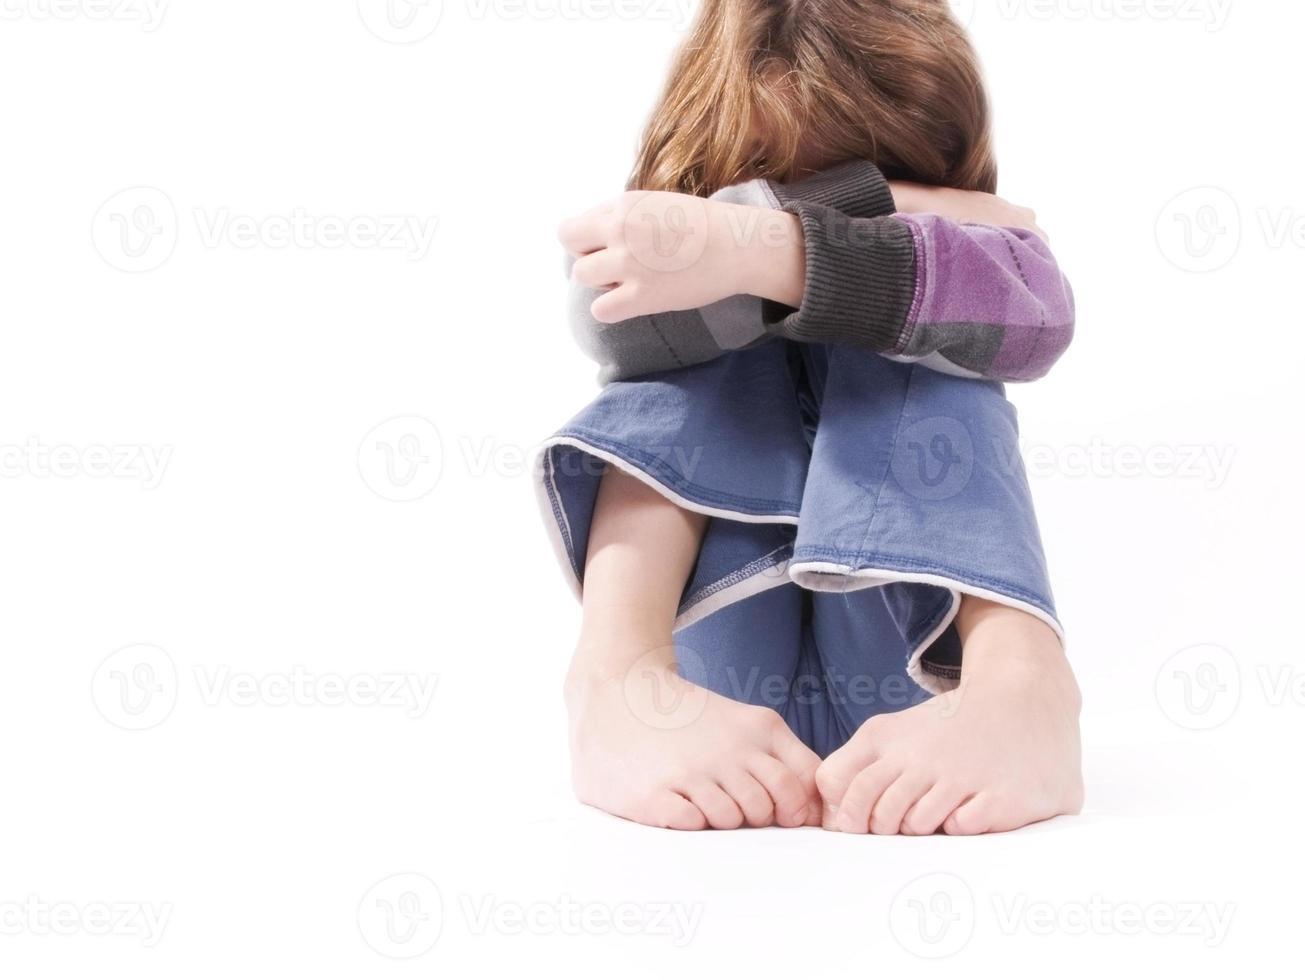 Sad Child, Feet in Emotional Position photo